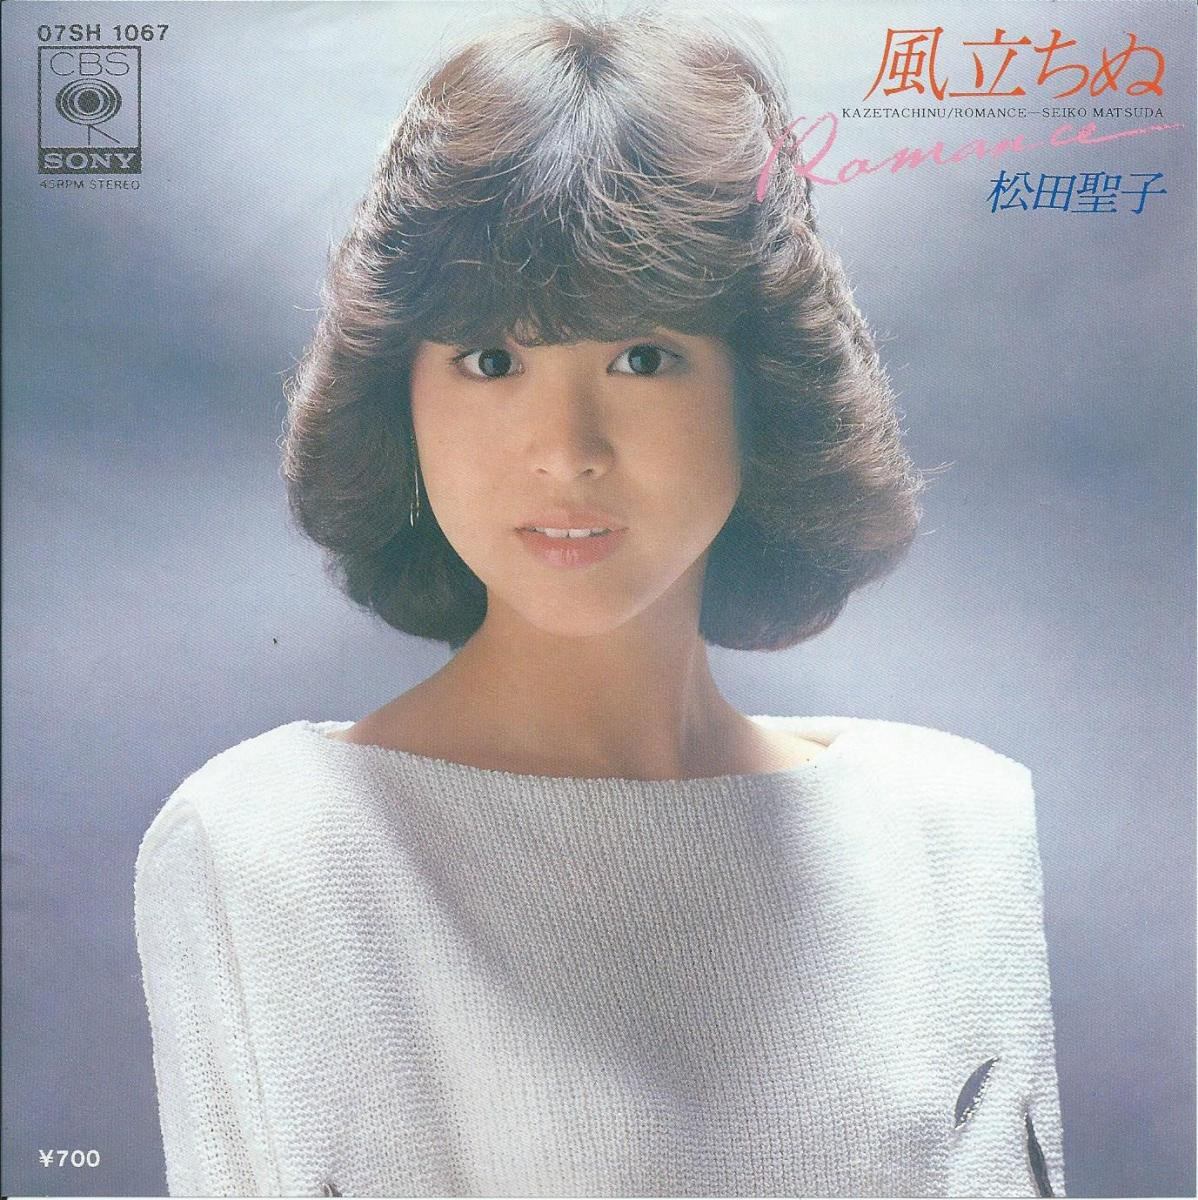 松田聖子 SEIKO MATSUDA / 風立ちぬ / KAZETACHINU (大瀧詠一) / ROMANCE (7